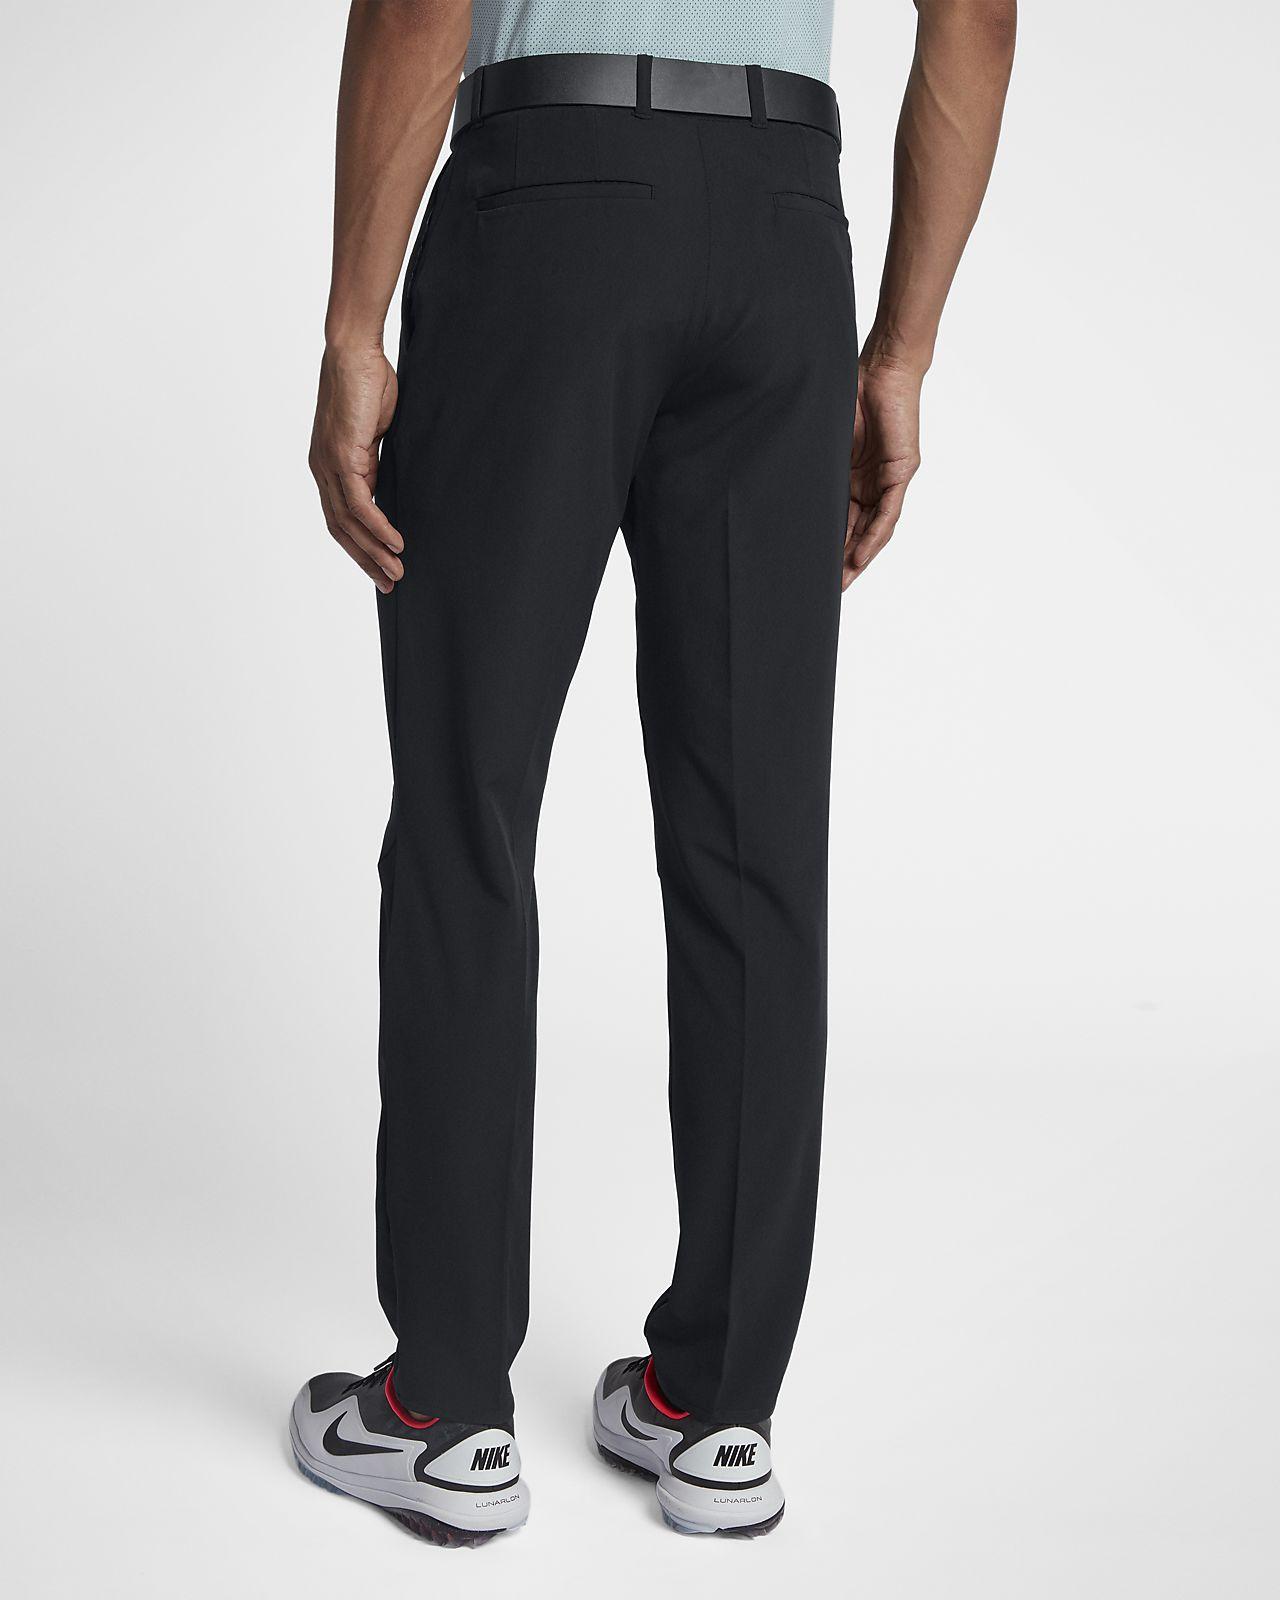 4805ac633f429 Nike Flex Men s Slim-Fit Golf Trousers. Nike.com GB